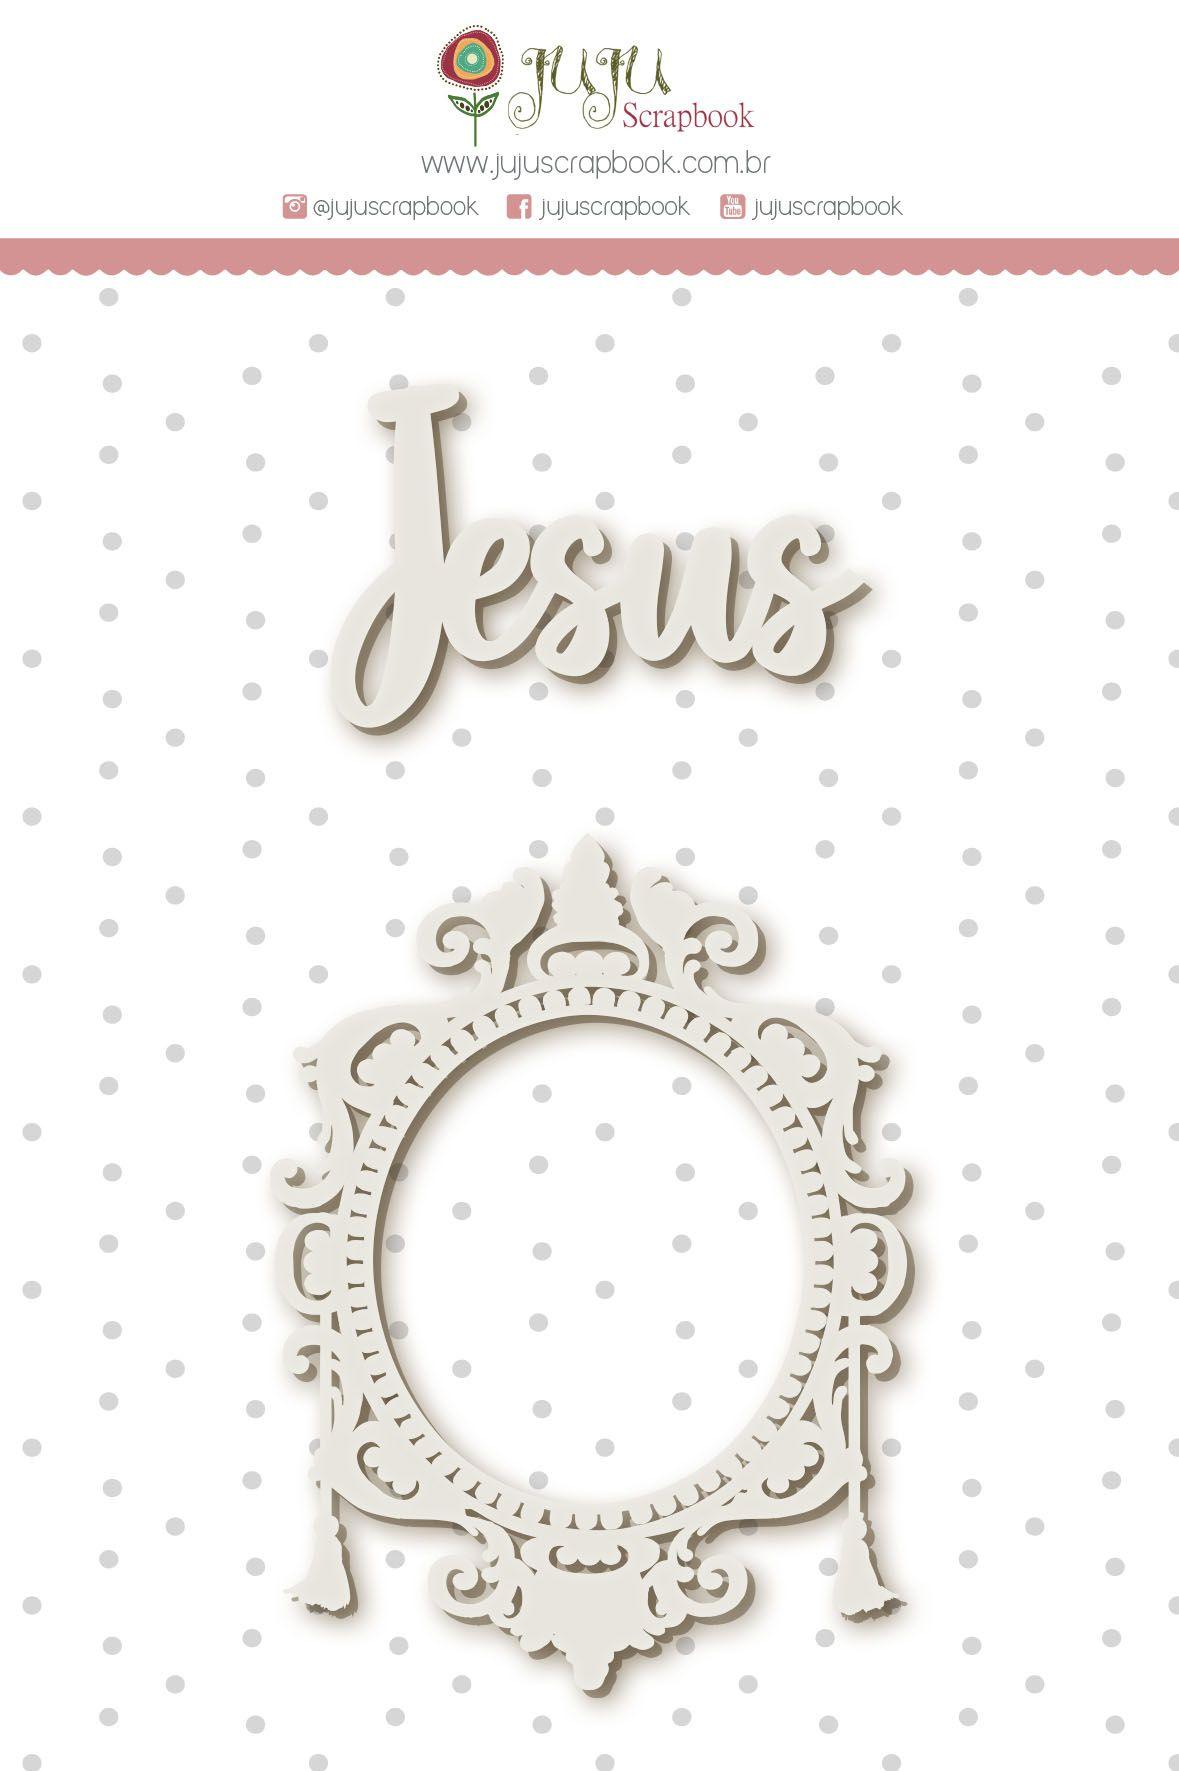 Enfeite Chipboard Branco Jesus - Coleção Vai com Fé - JuJu Scrapbook  - JuJu Scrapbook